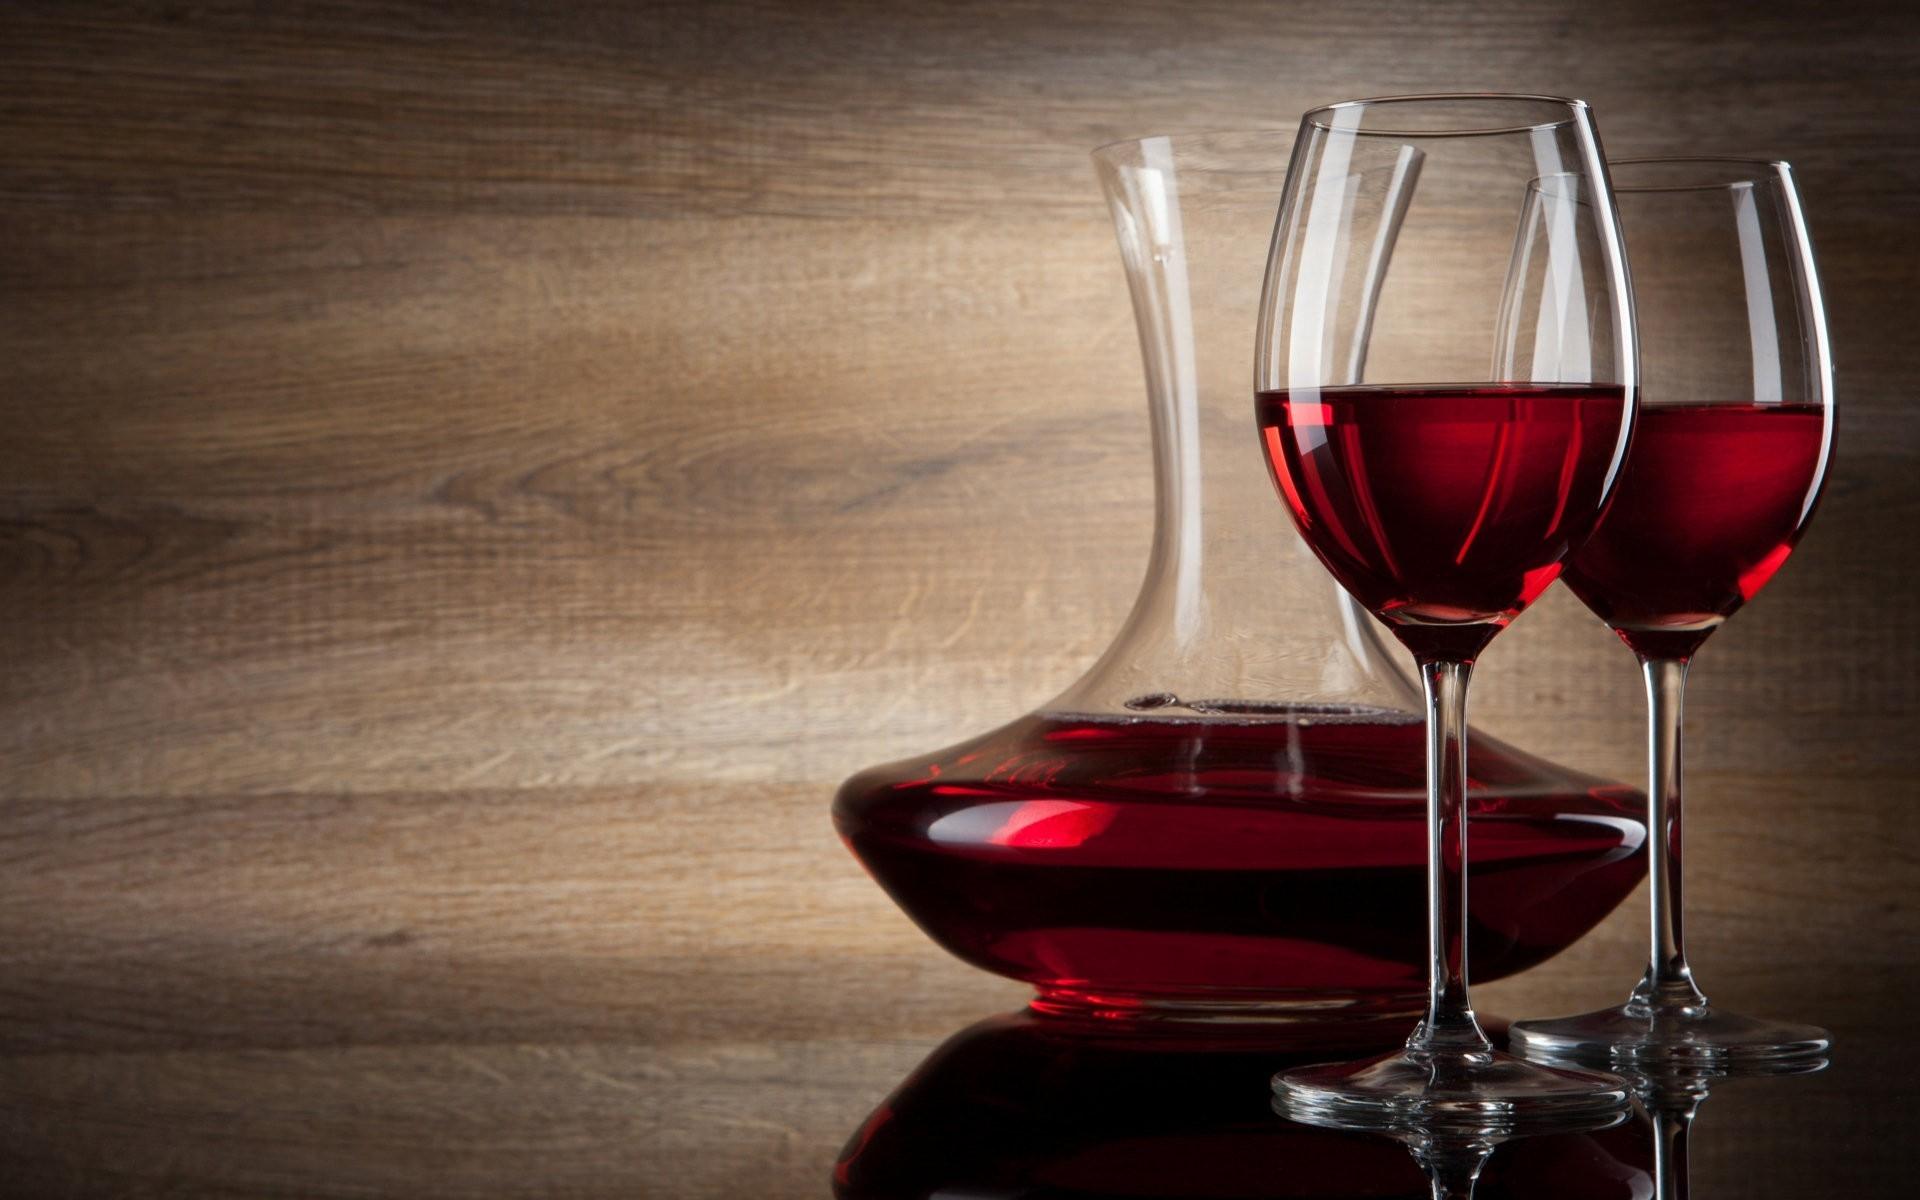 Weingläser Rot hintergrundbilder wein weingläser rot 1920x1200 wallpaperup